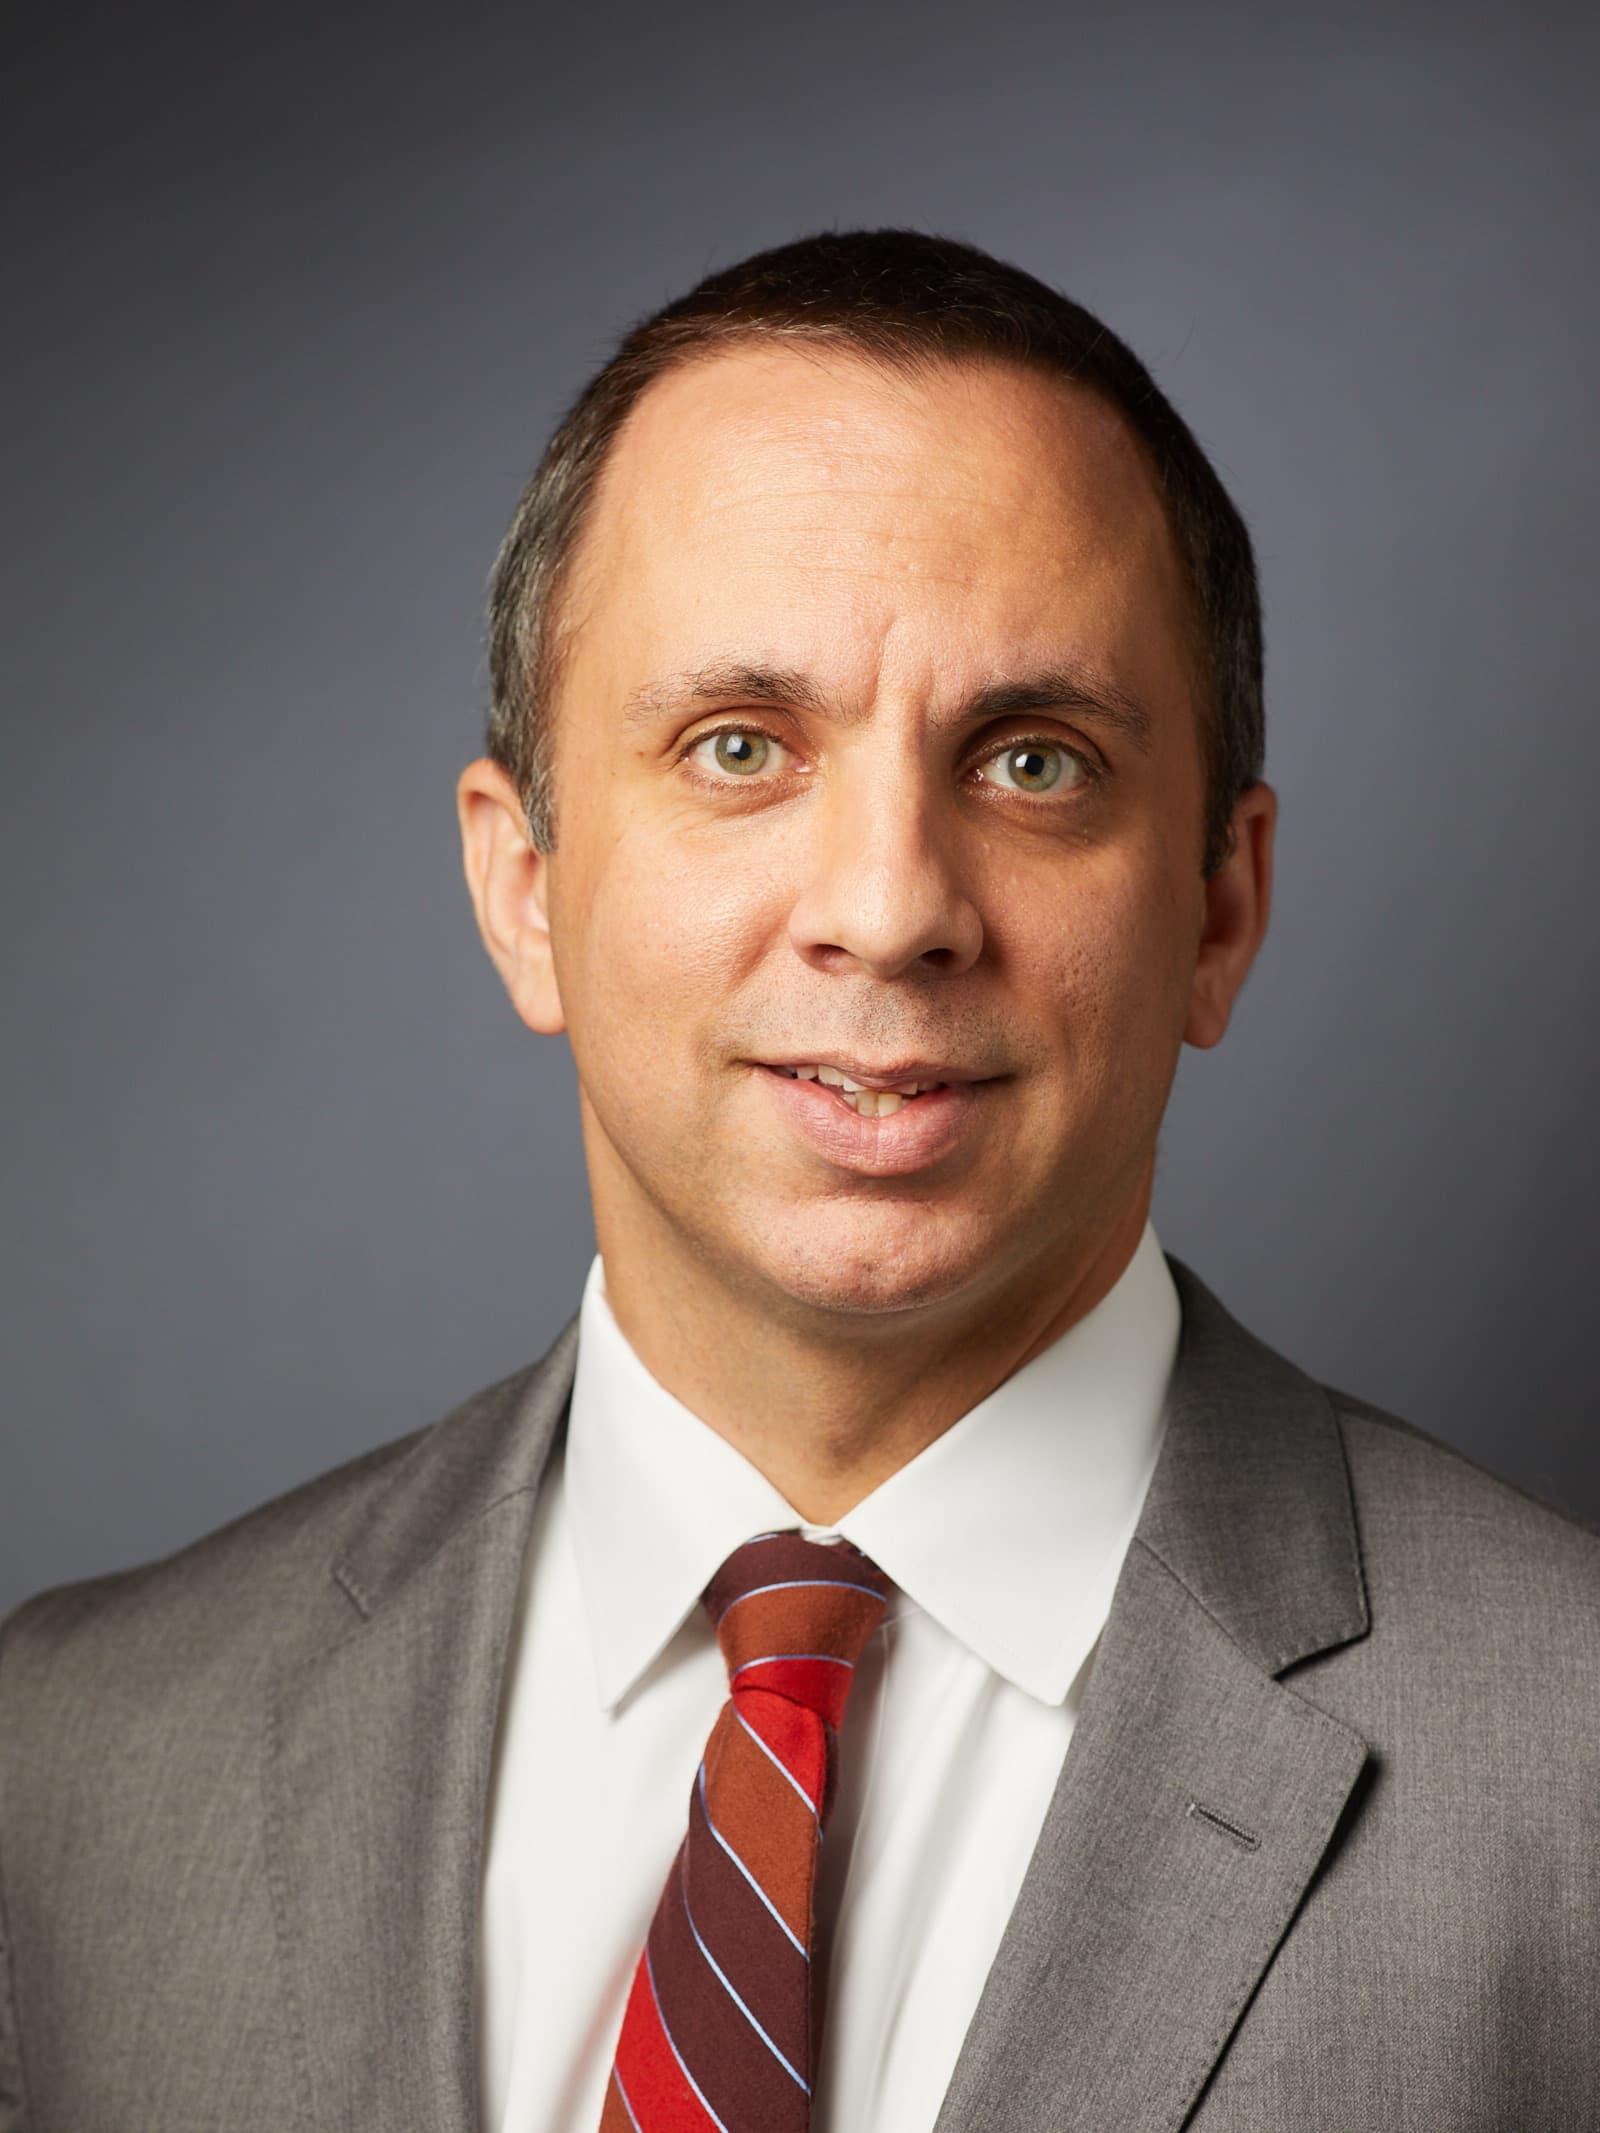 Jason Catanzaro